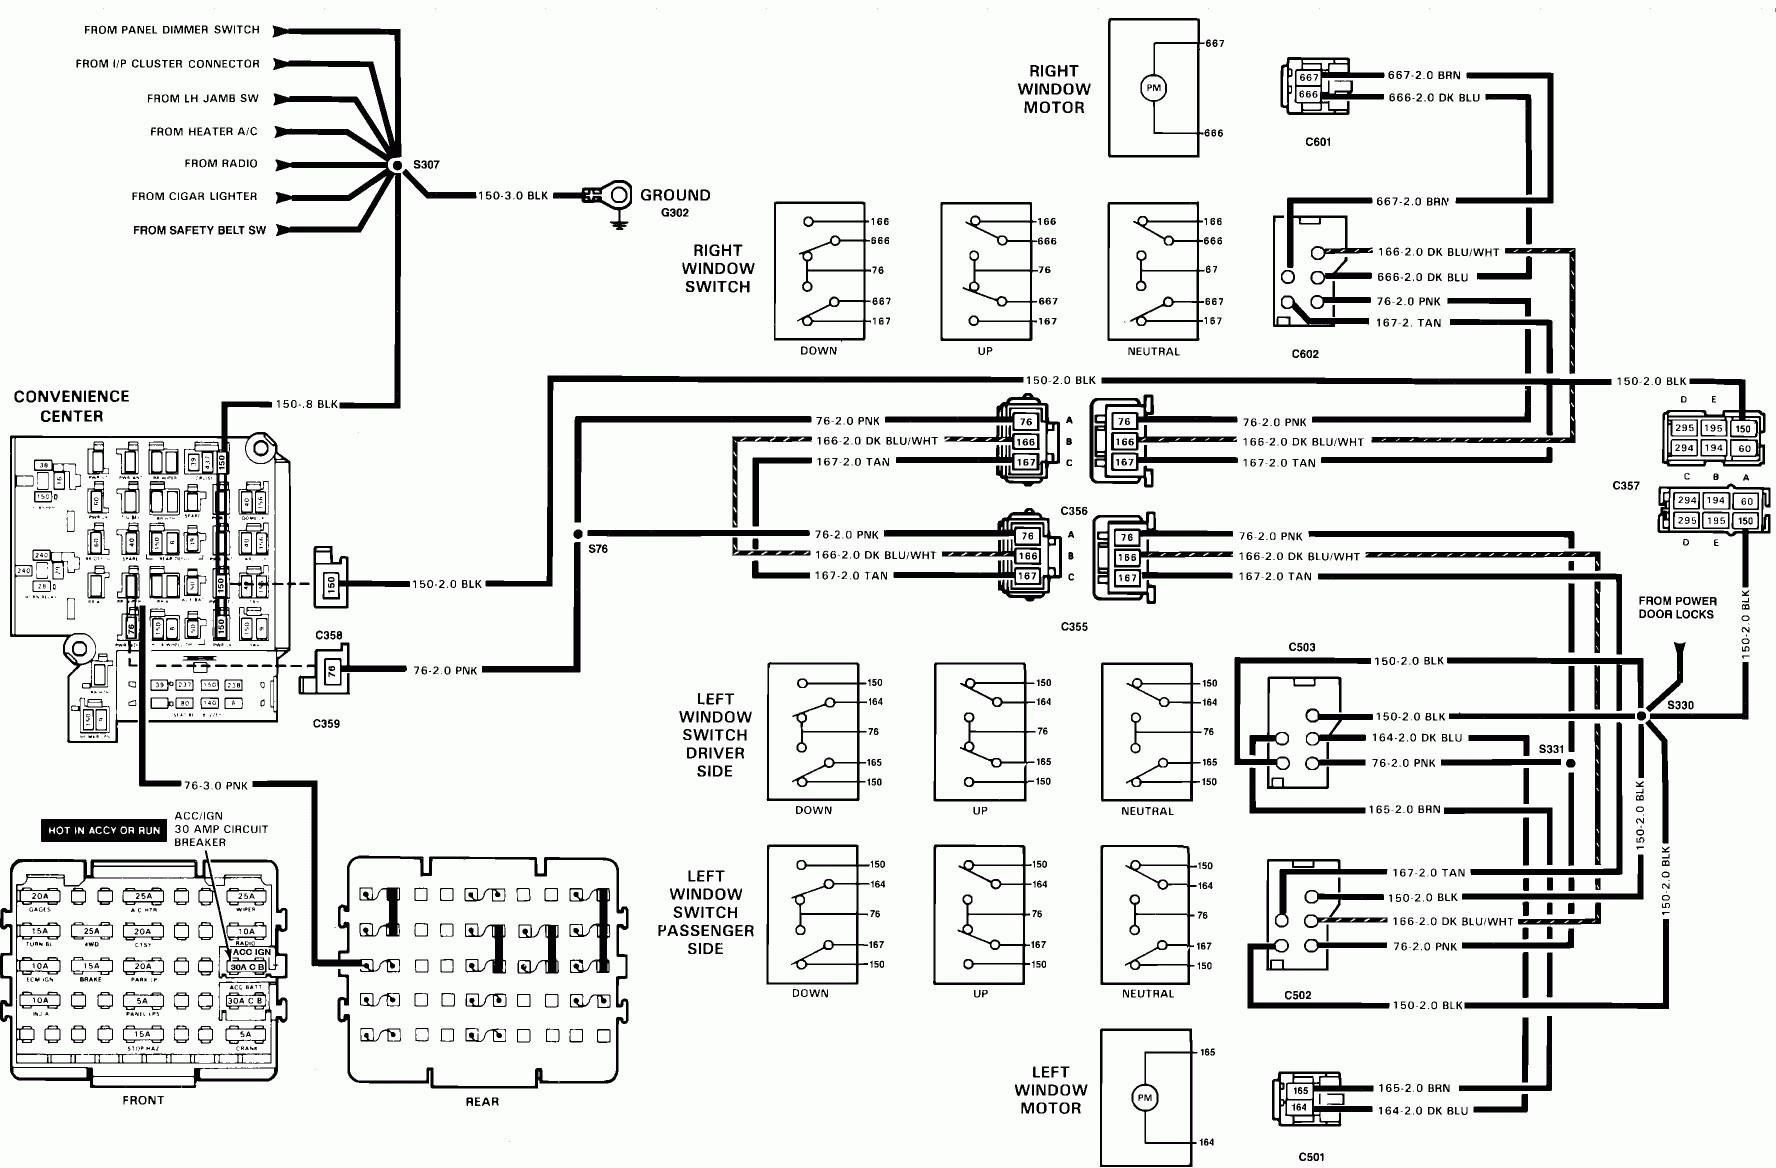 Swell 1985 Chevy Truck Power Window Wiring Diagram Basic Electronics Wiring Cloud Domeilariaidewilluminateatxorg